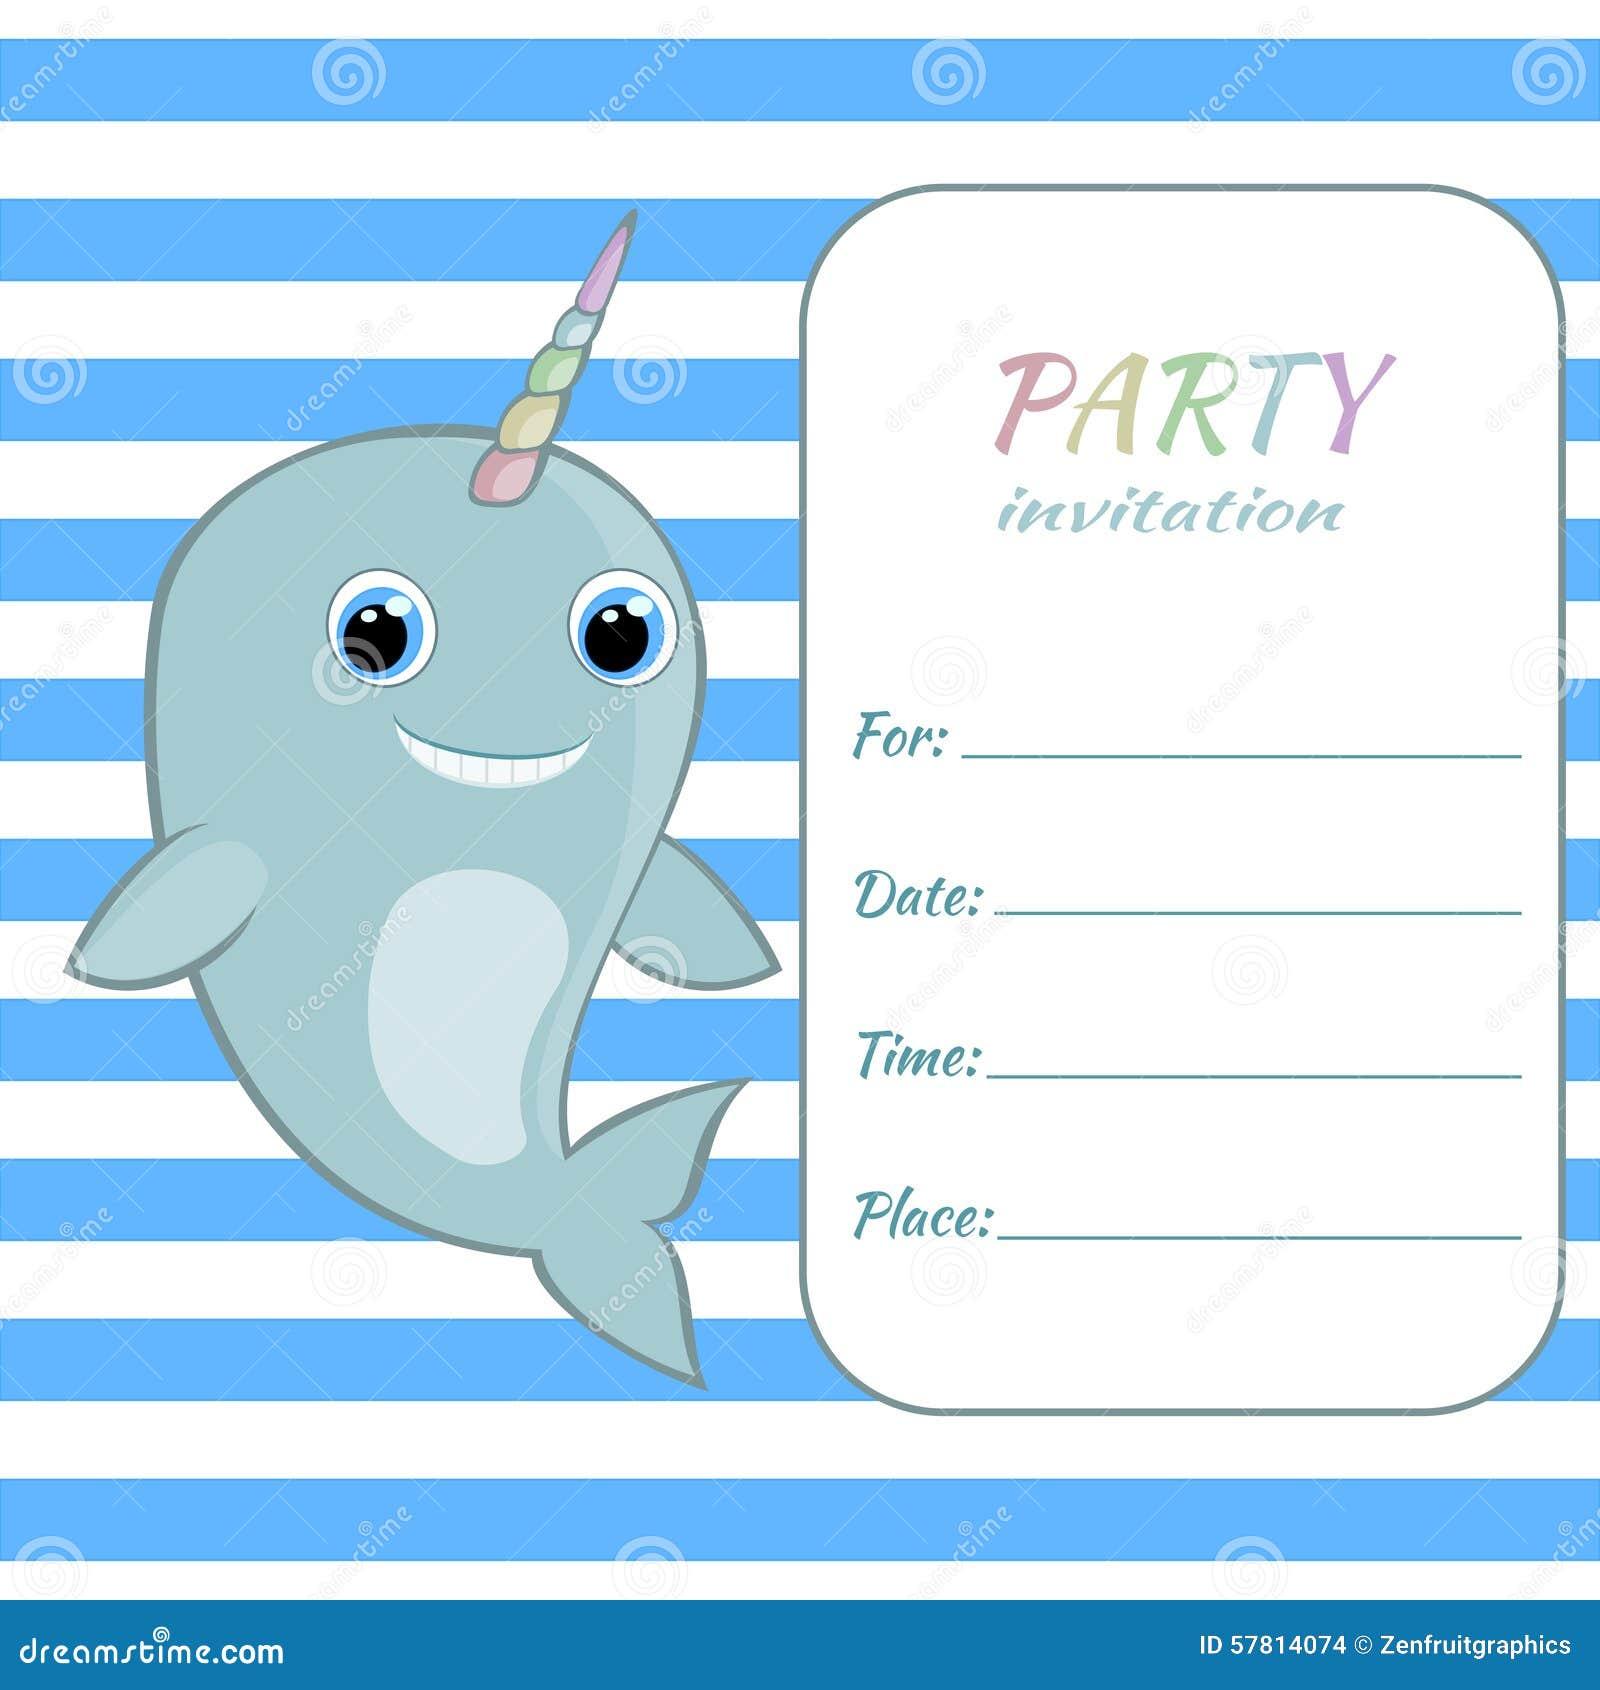 kids birthday invitations template - Besik.eighty3.co